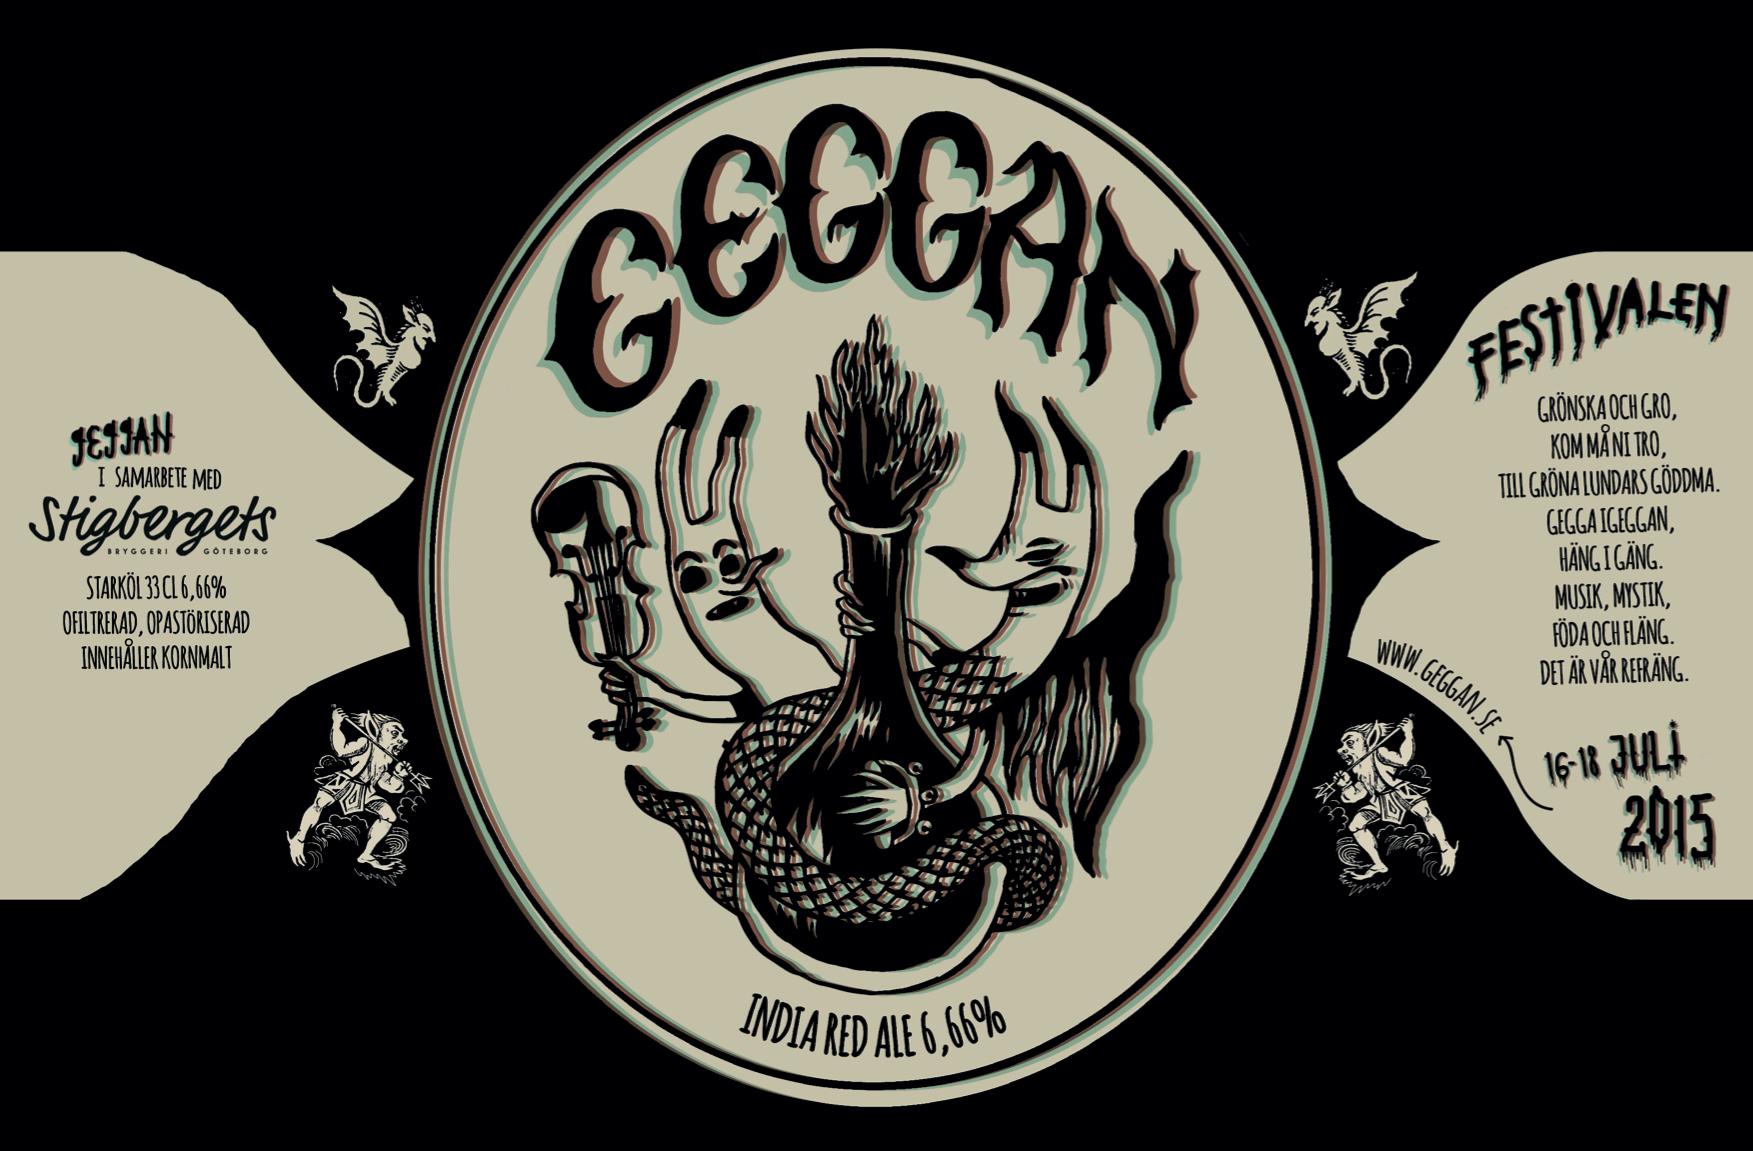 060515-geggan_poster_2015